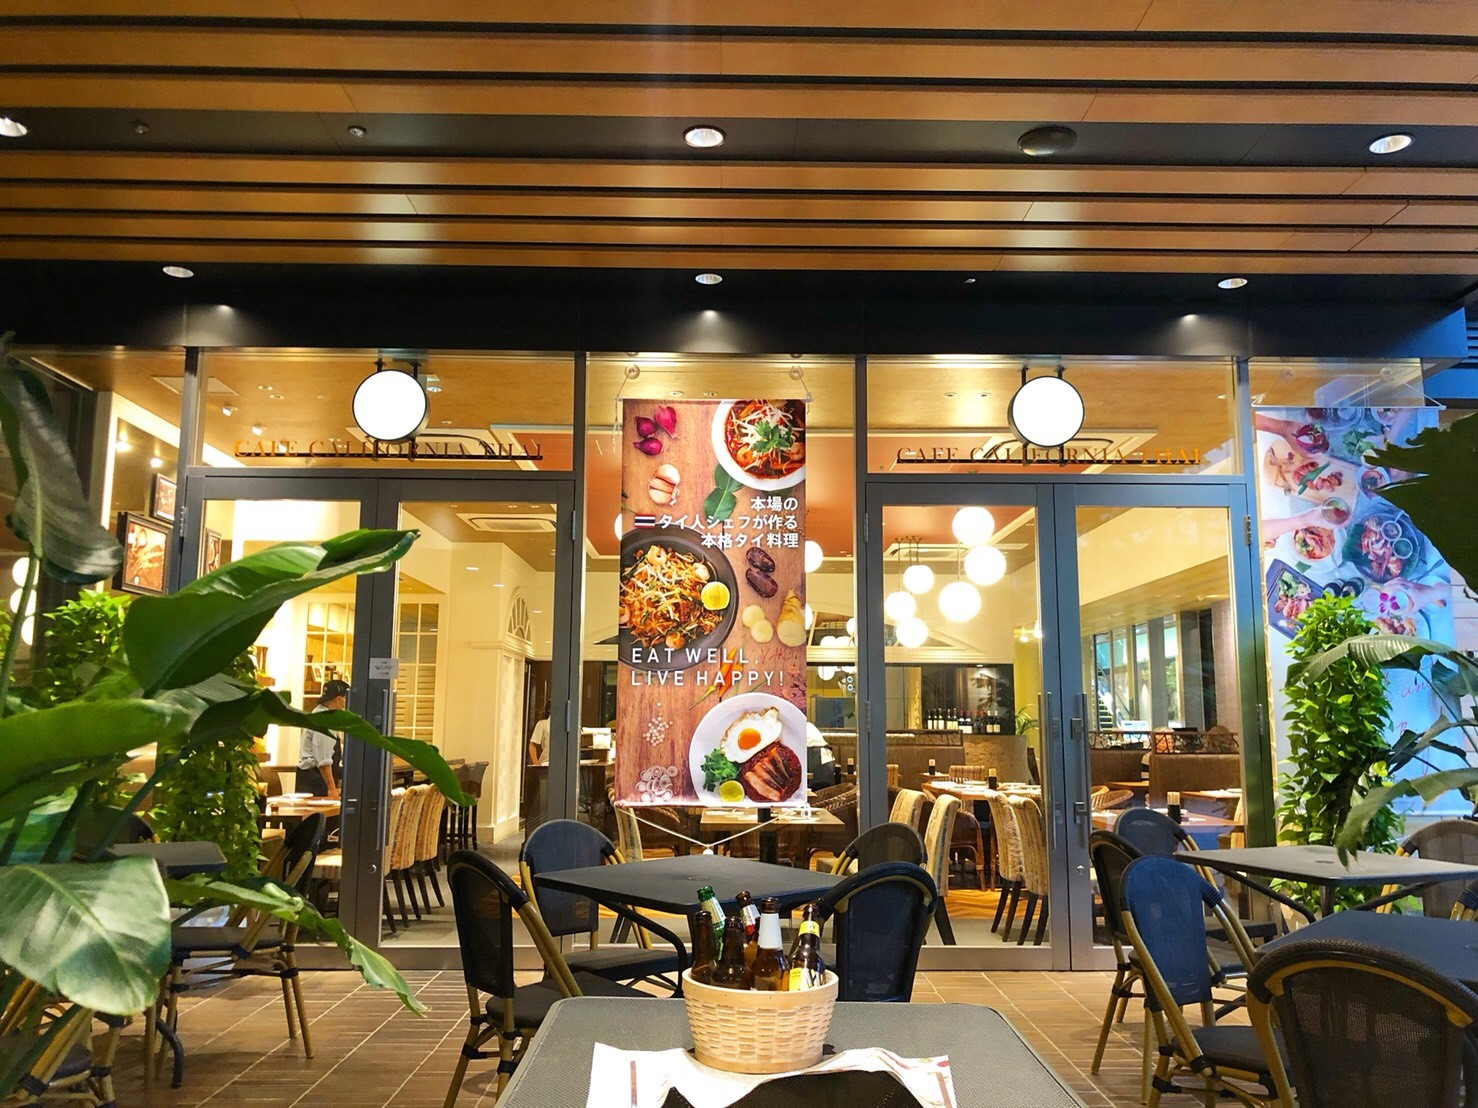 Gin Khao Cafe